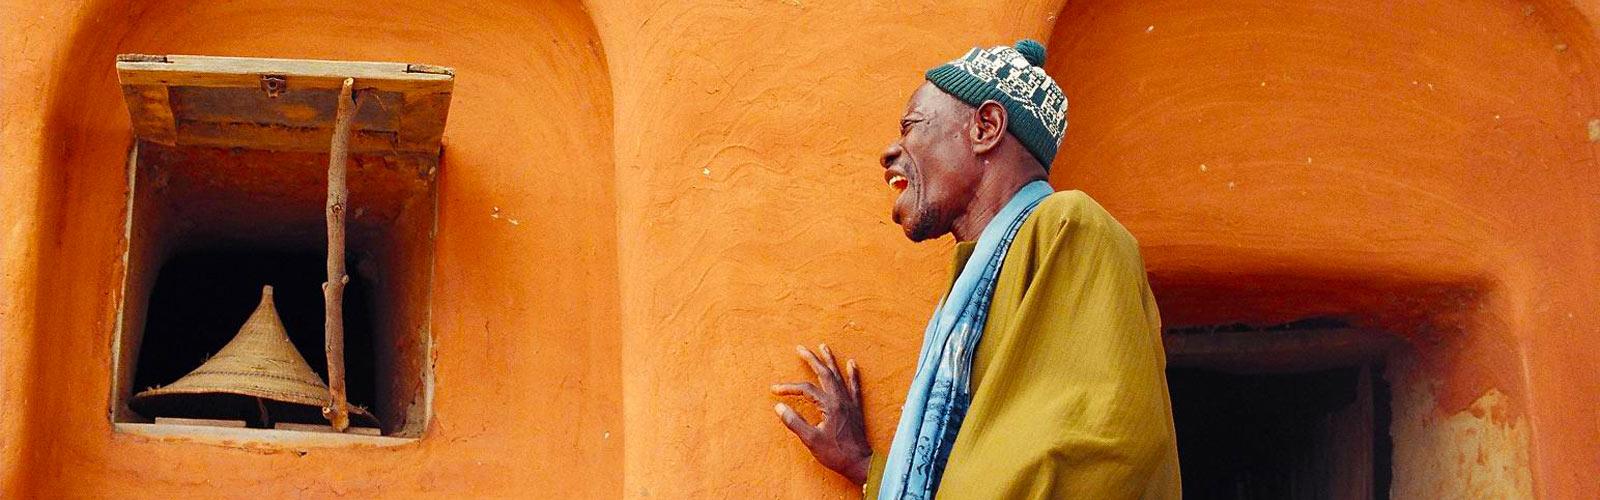 Viaje a Burkina Faso. 03 Dic.